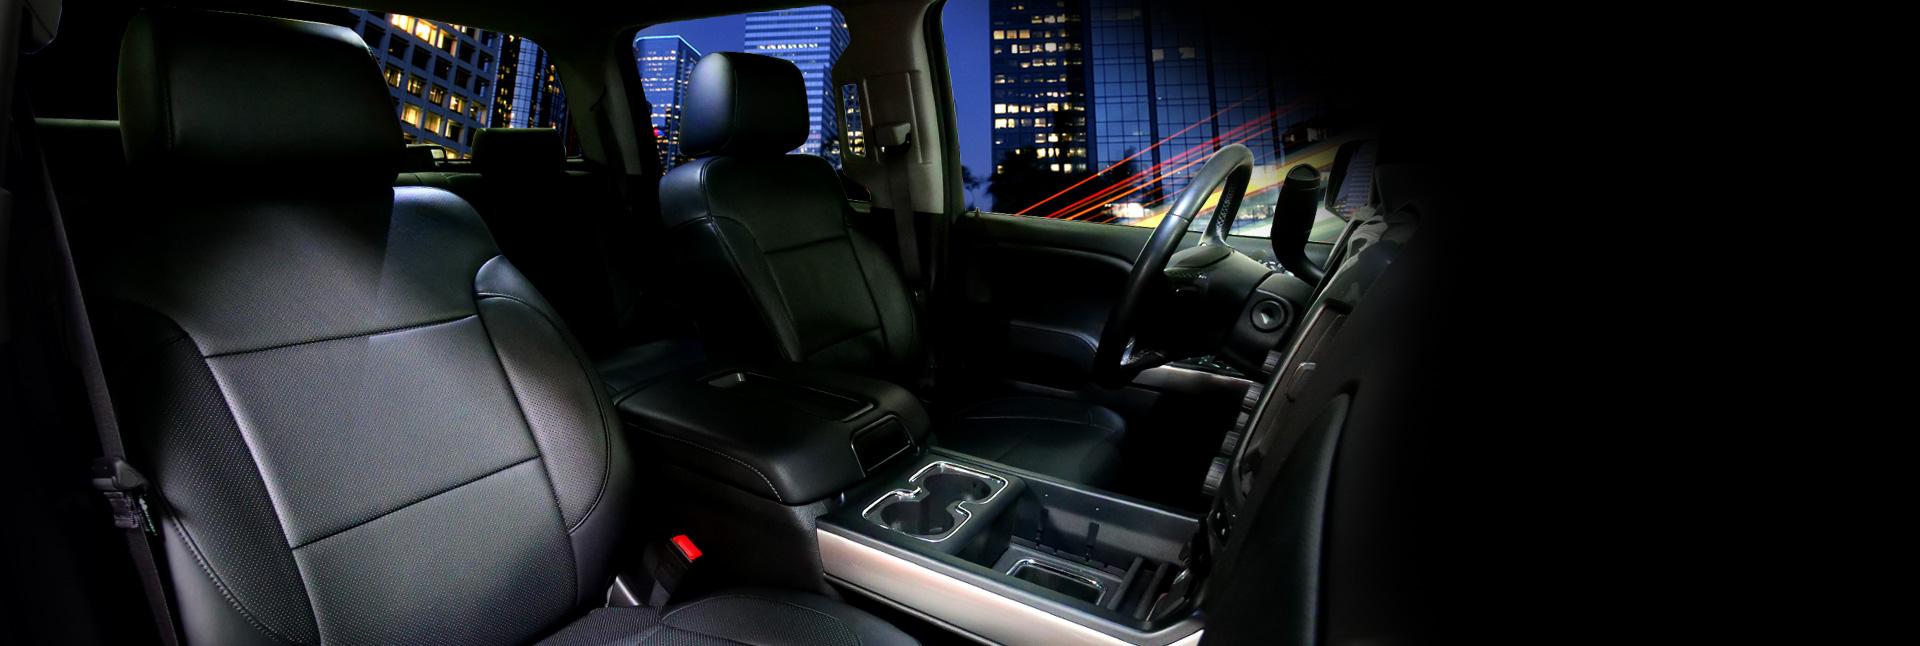 Car intterior